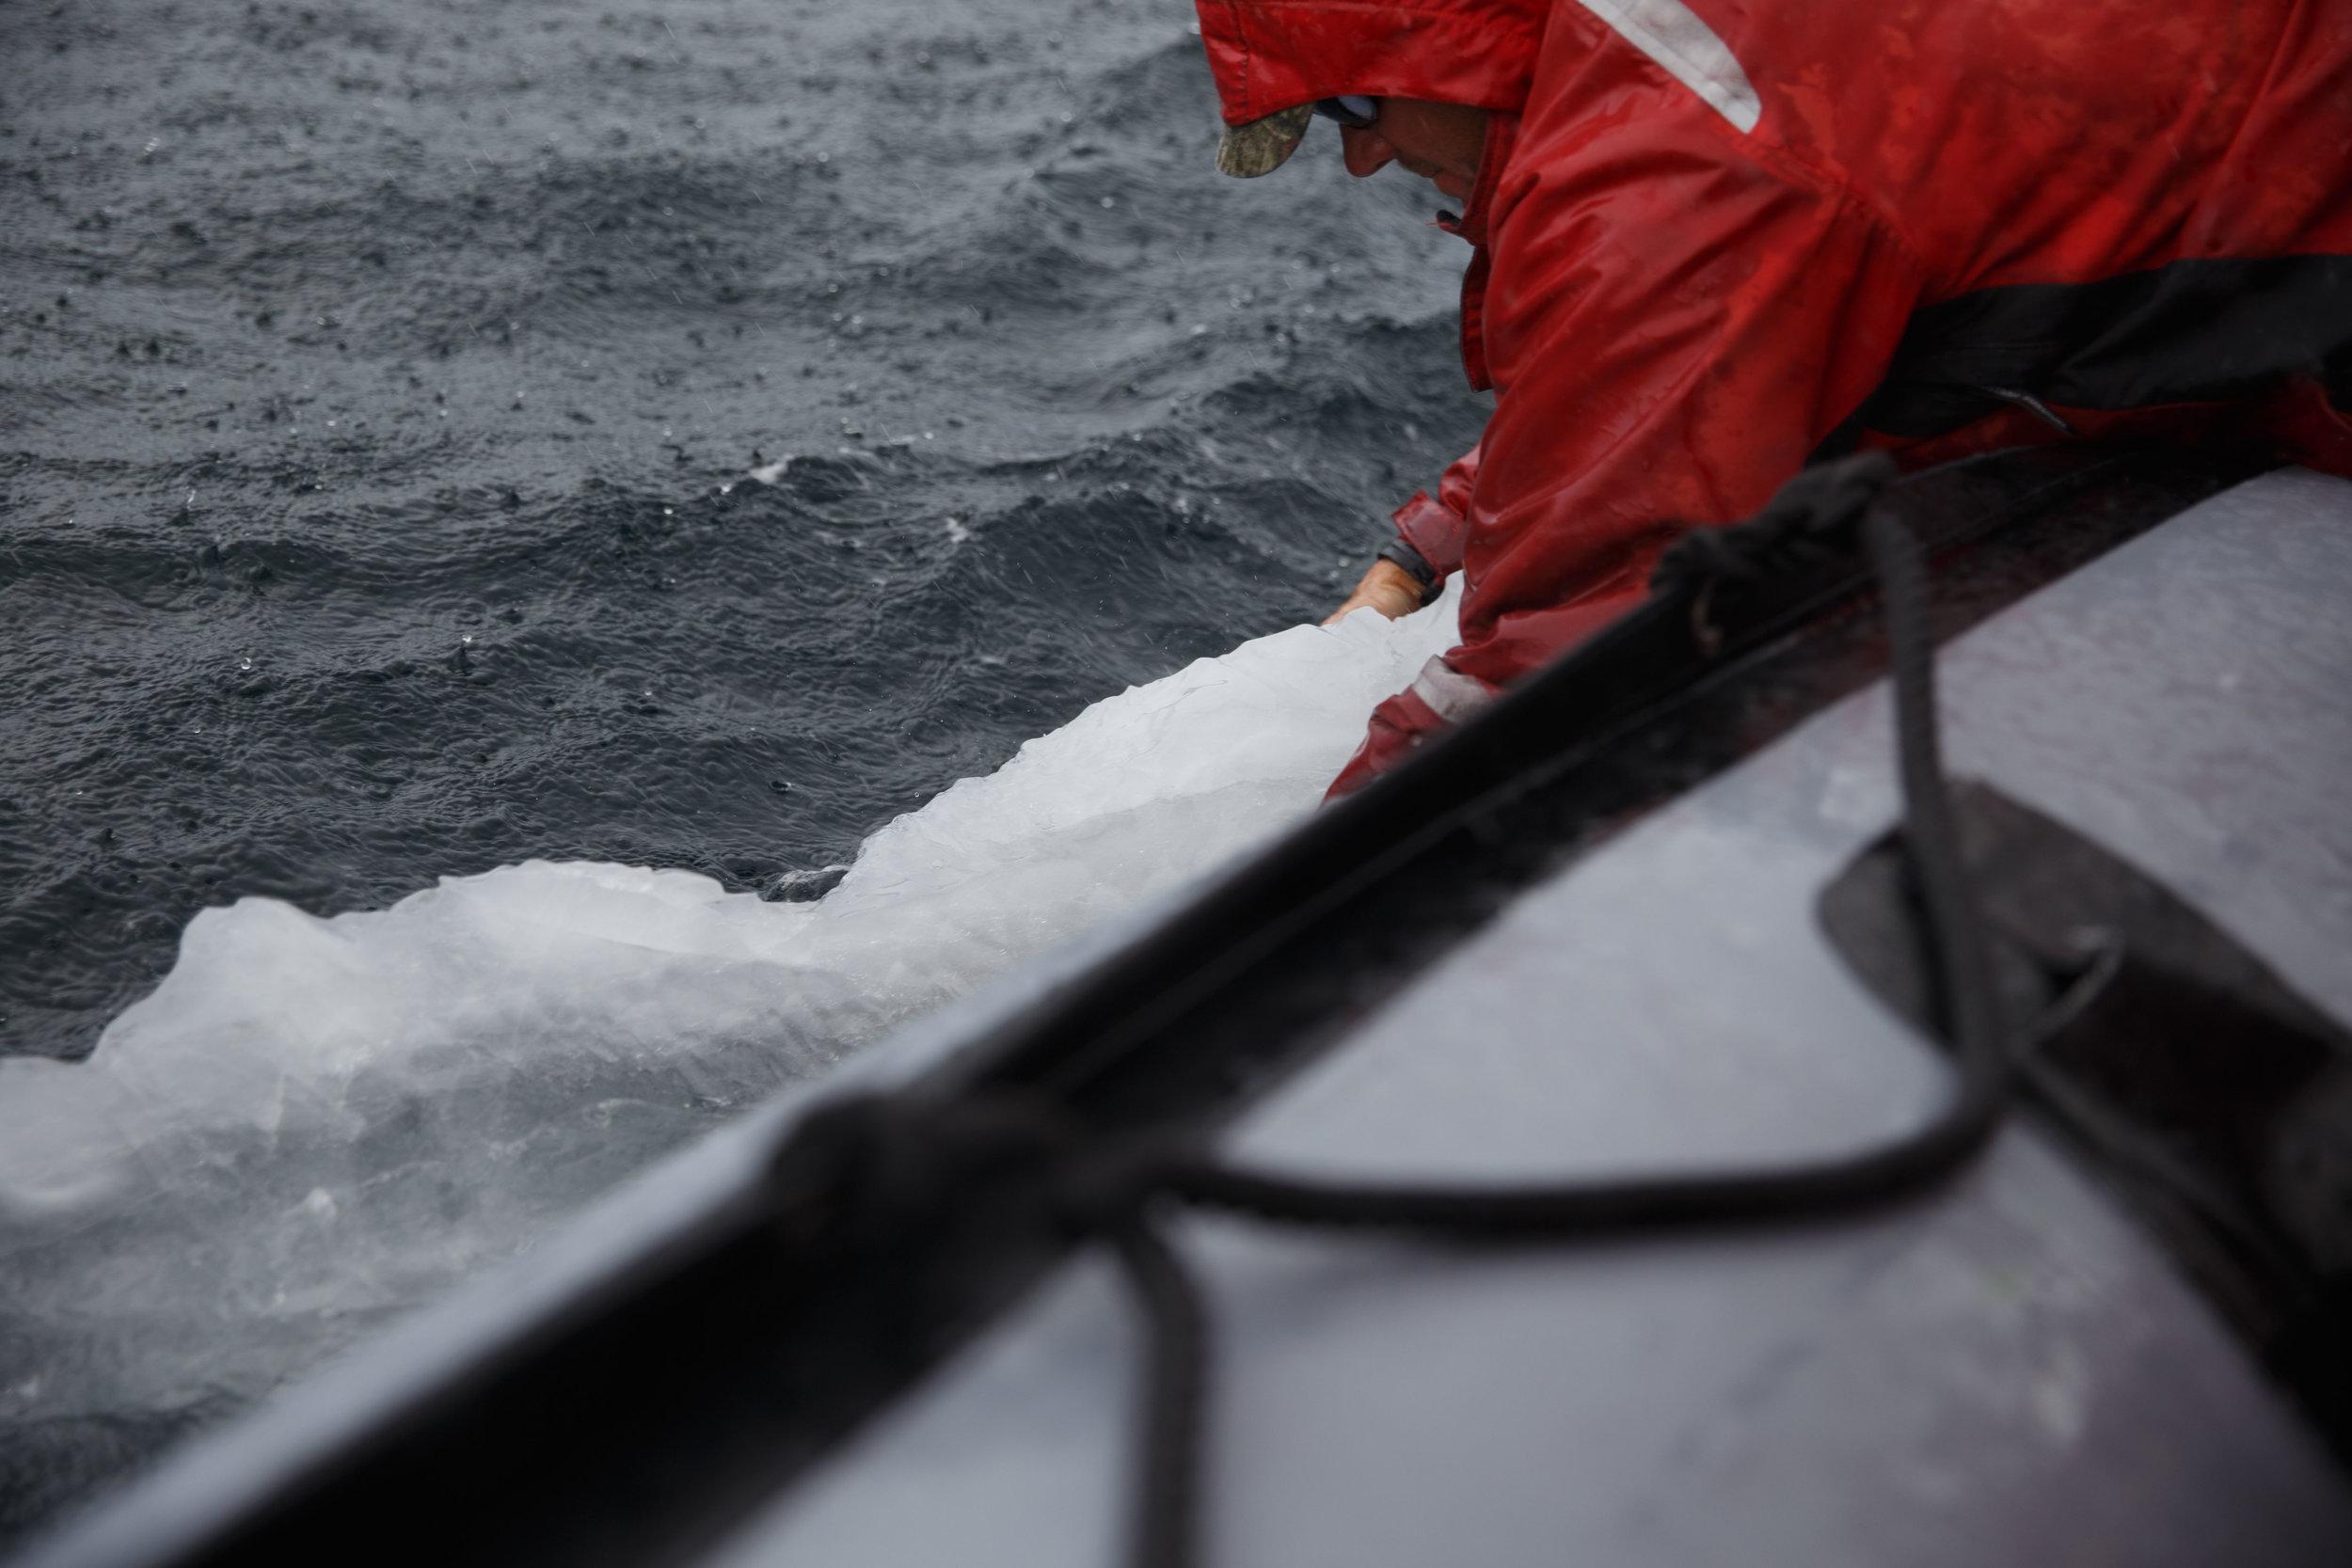 Collecting some Iceberg Chunks